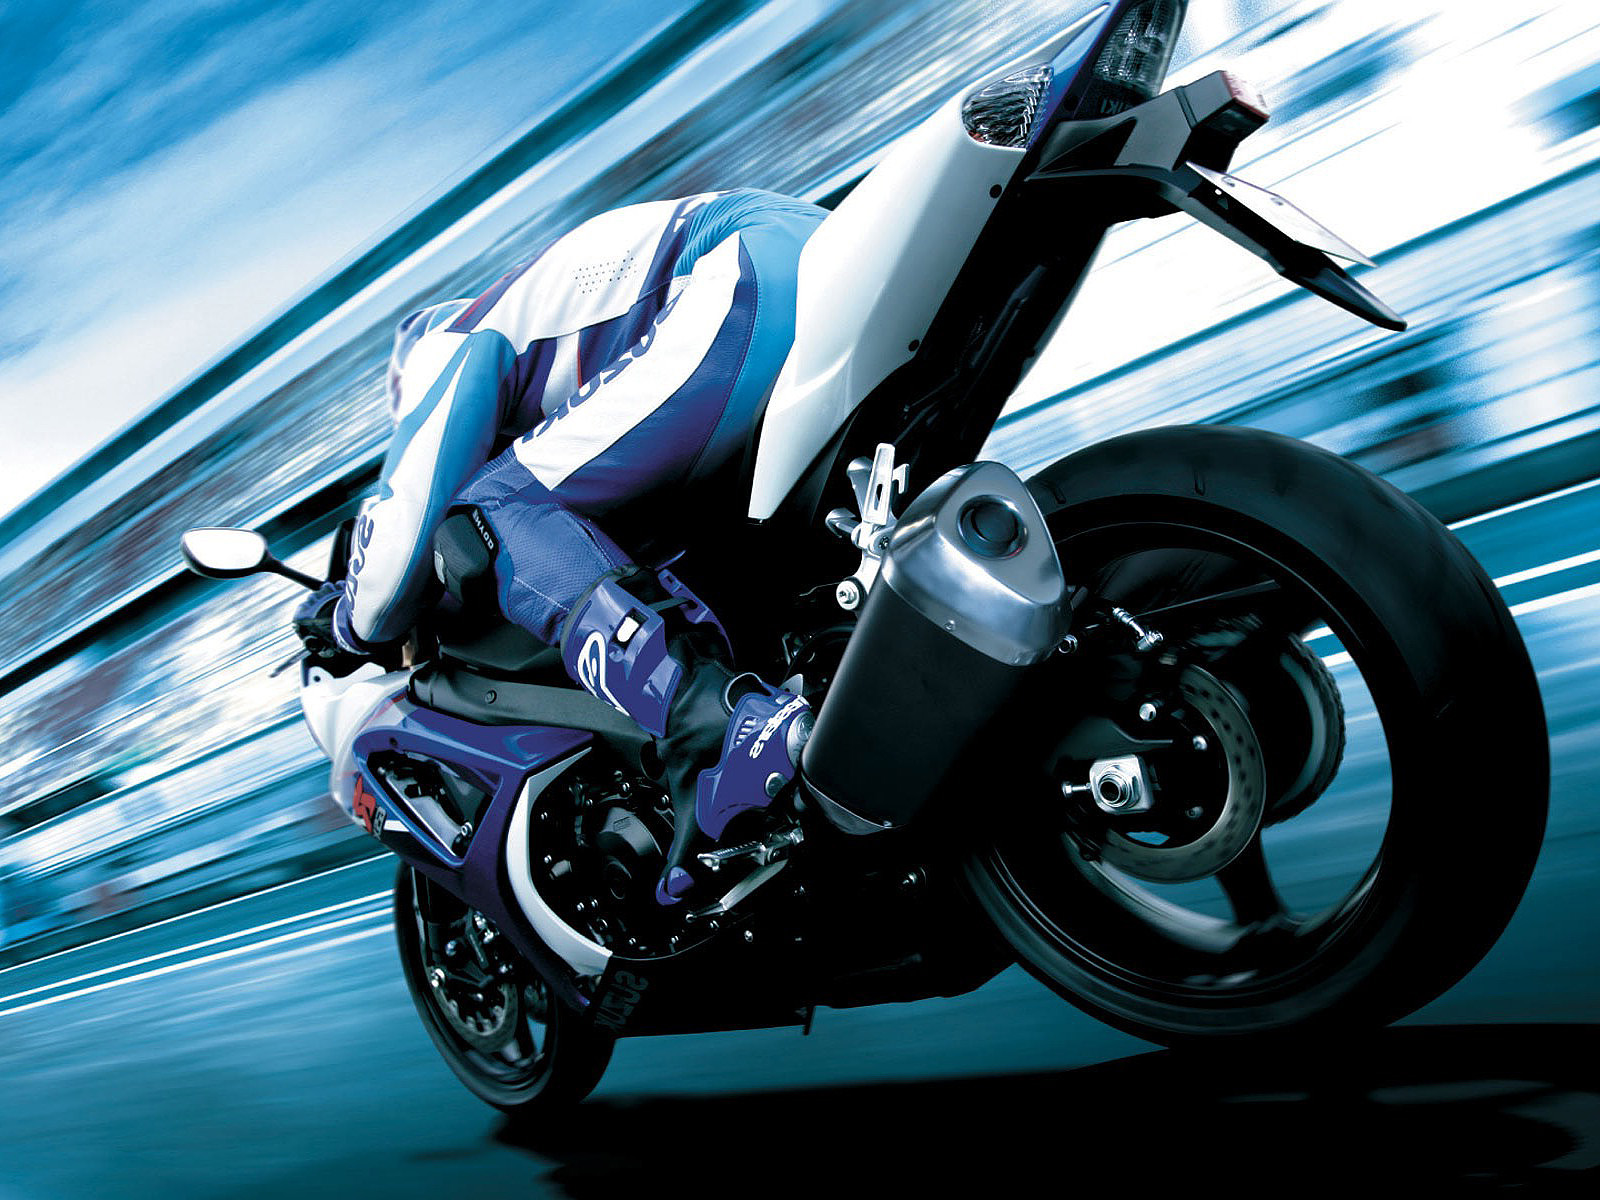 Top Desktop Motorcycles Wallpapers Hd Beautiful Motorcycle Wallpaper 1600x1200